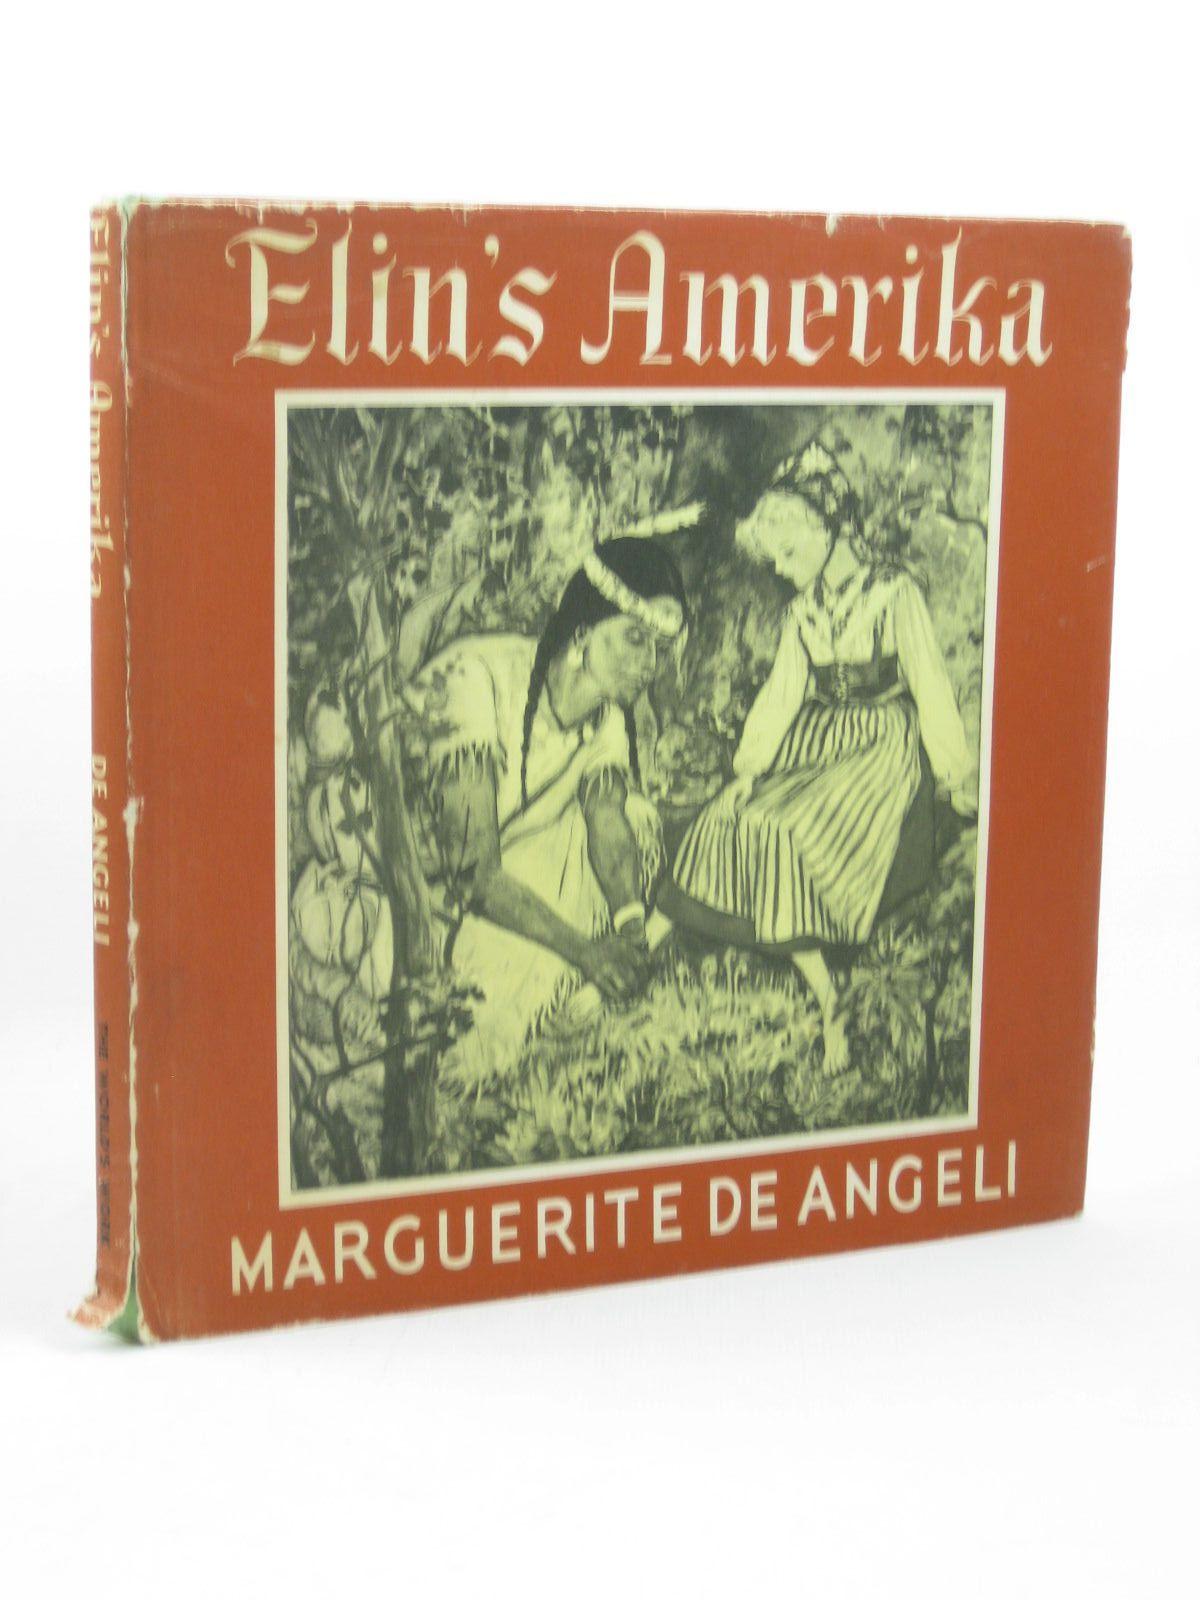 Photo of ELIN'S AMERIKA written by De Angeli, Marguerite illustrated by De Angeli, Marguerite published by World's Work Ltd. (STOCK CODE: 1402603)  for sale by Stella & Rose's Books